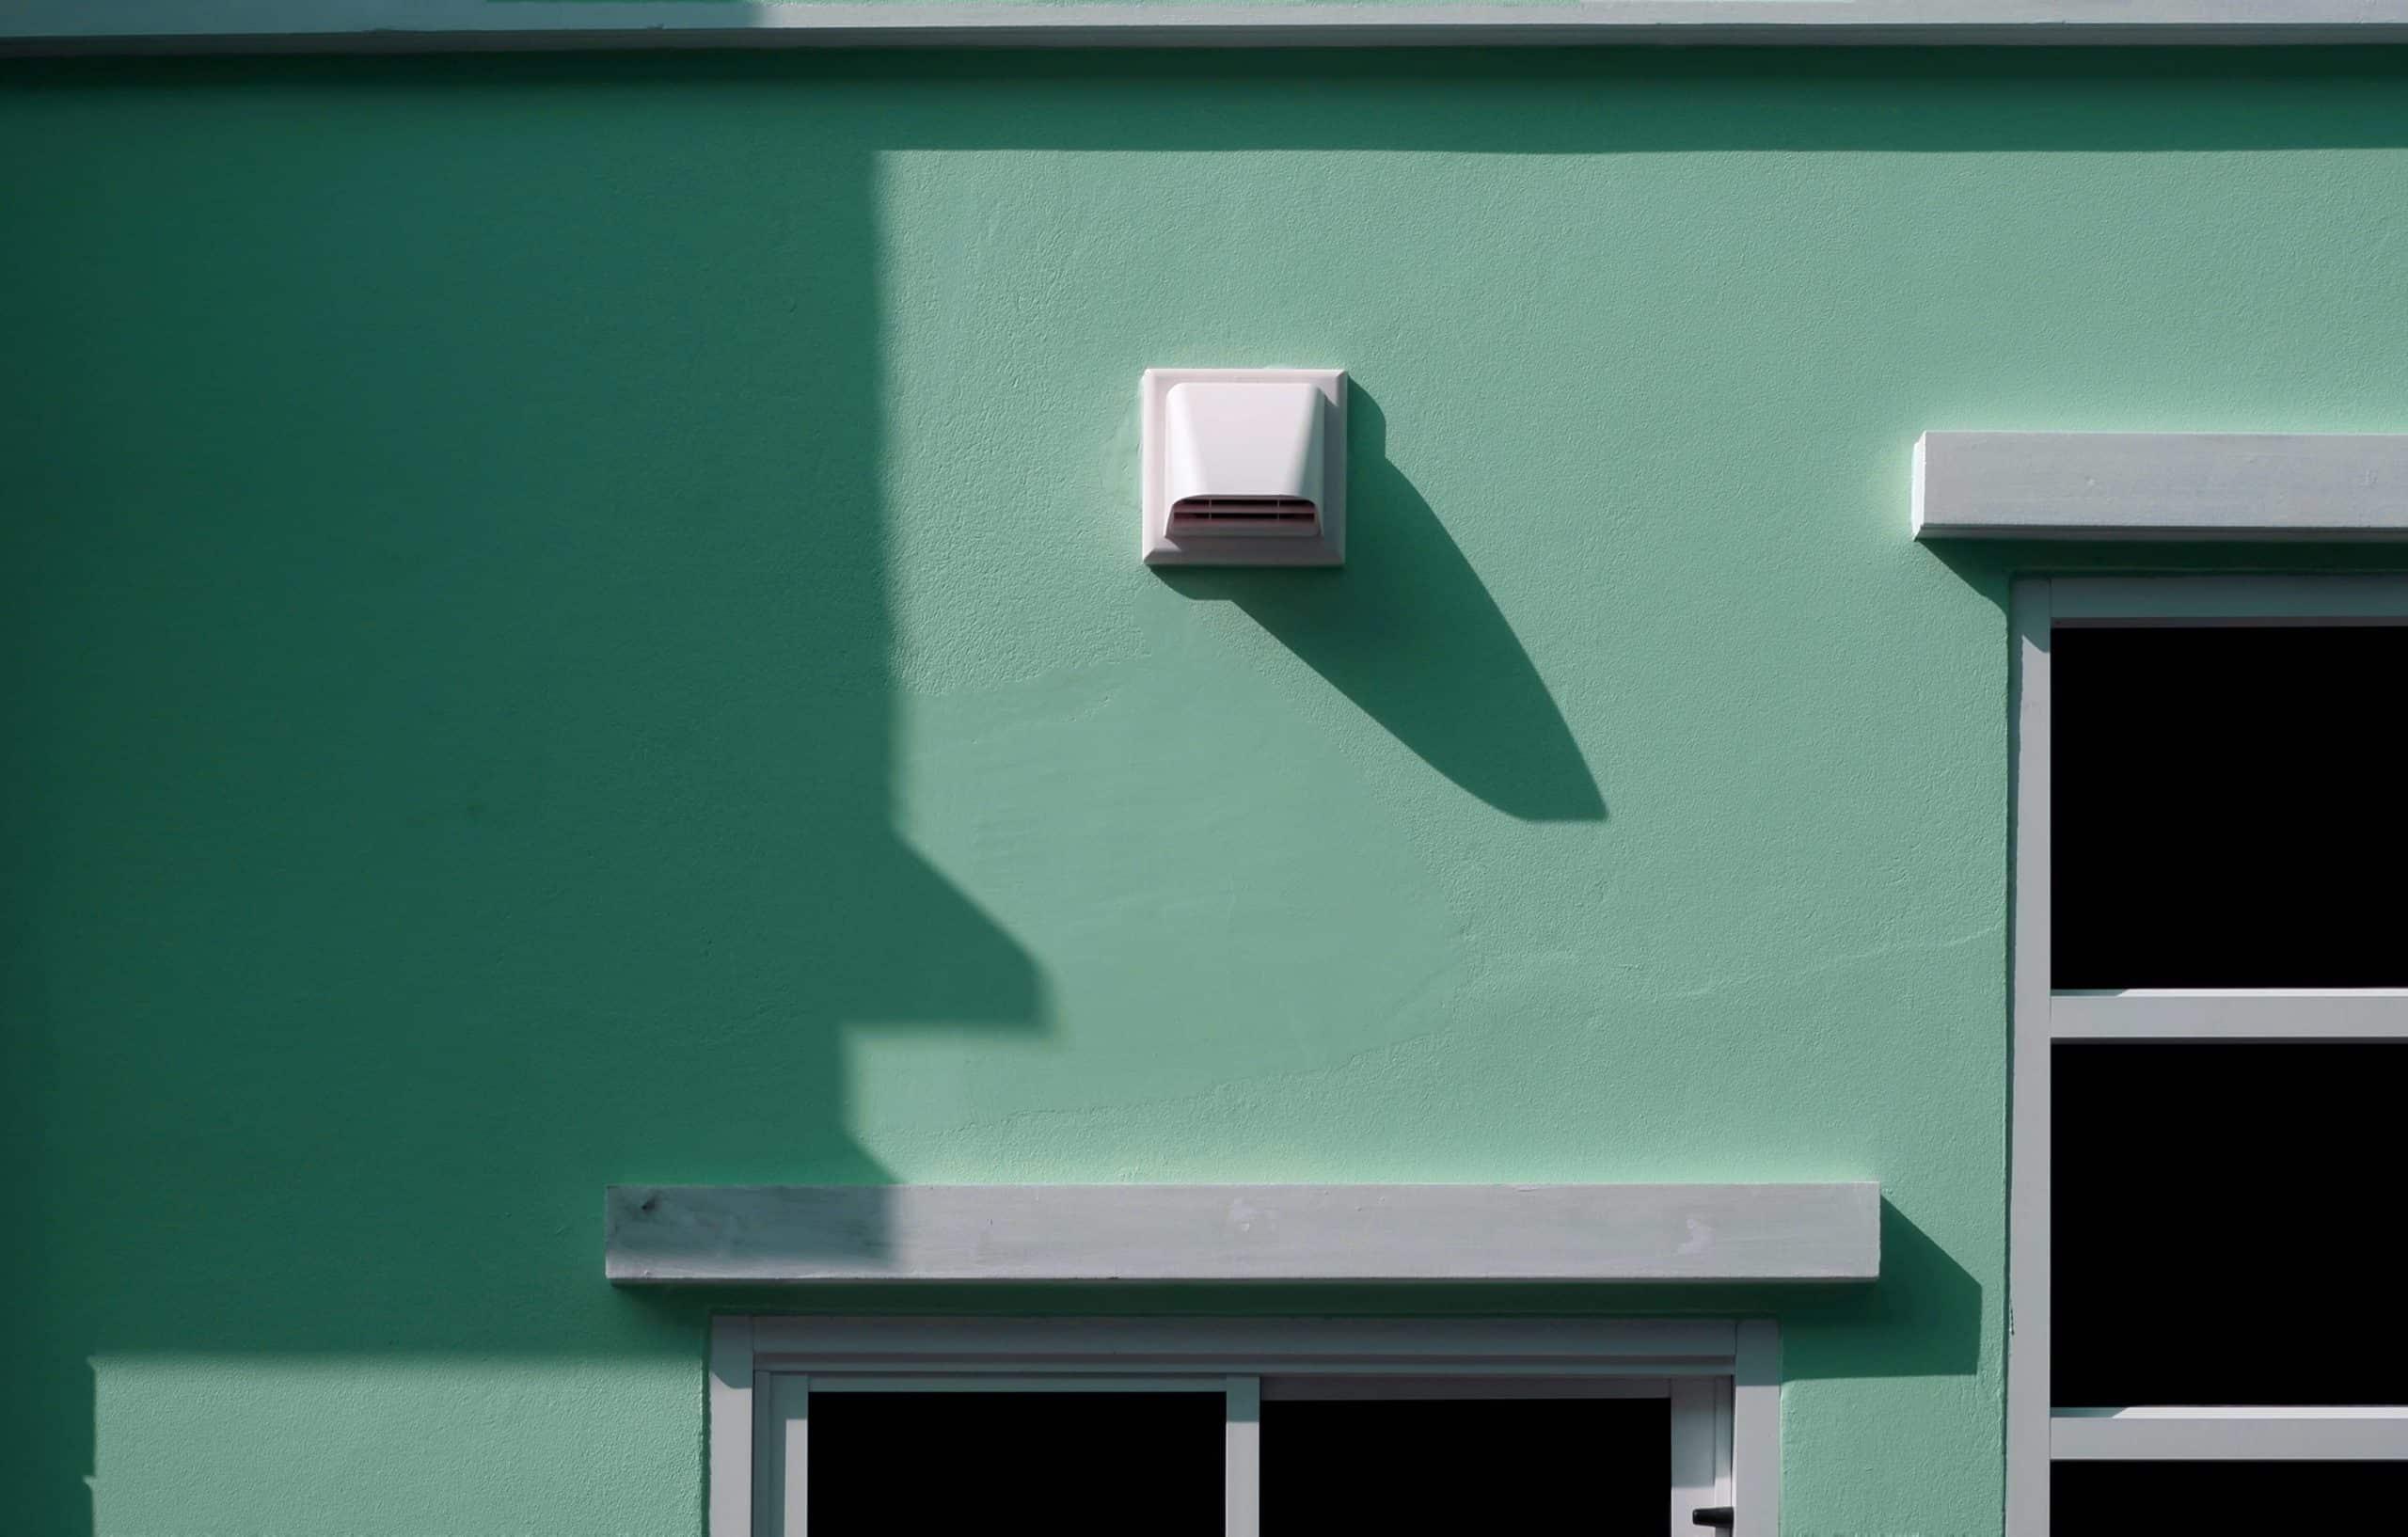 fresh air intake vent